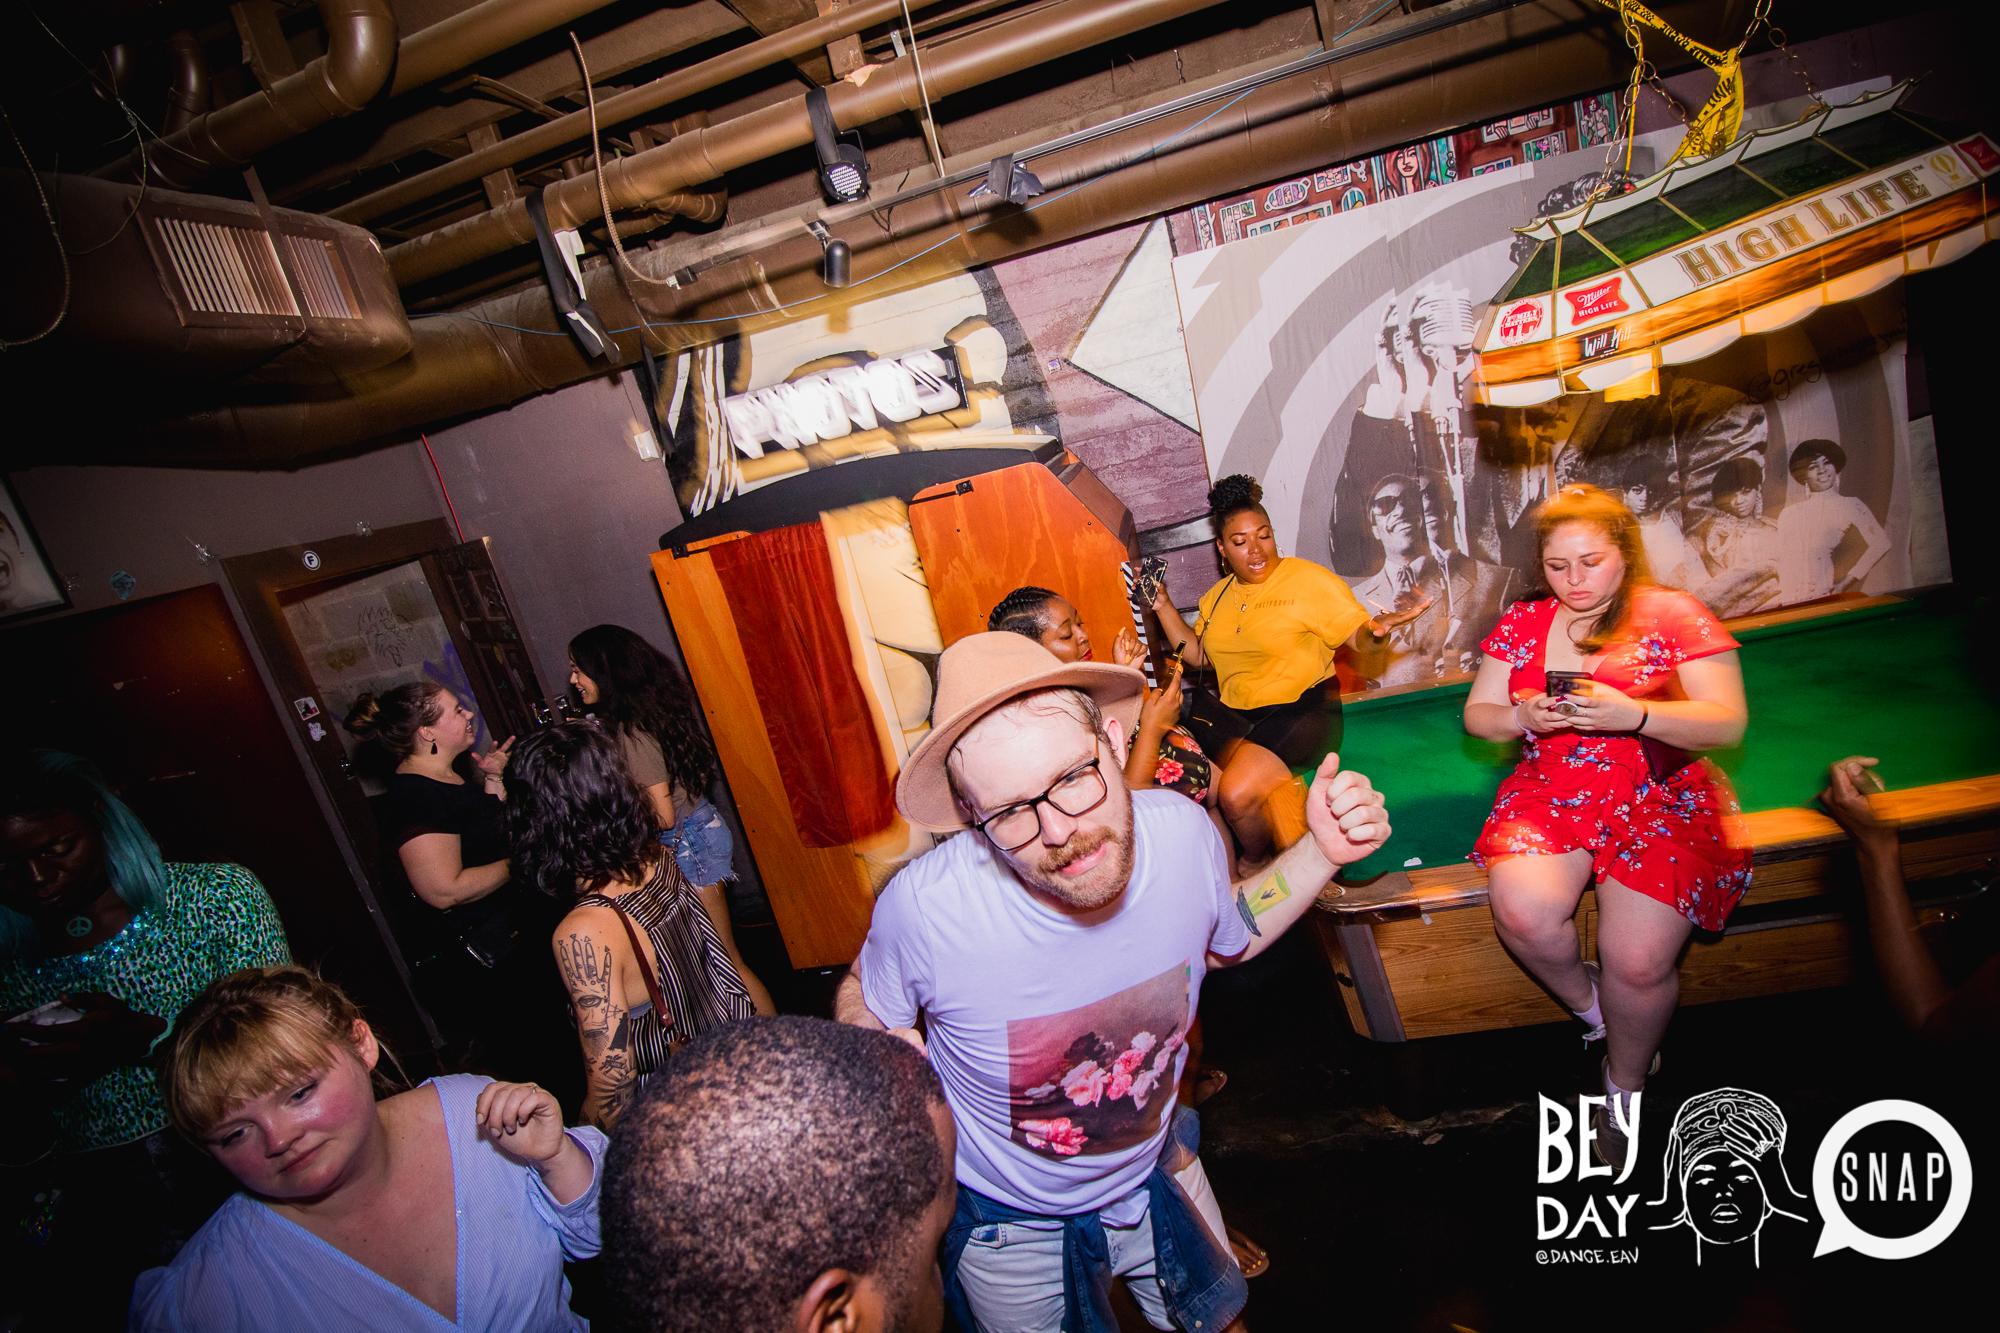 108Bey Day Grace Kelly The Basement Atlanta Oh Snap Kid.jpg